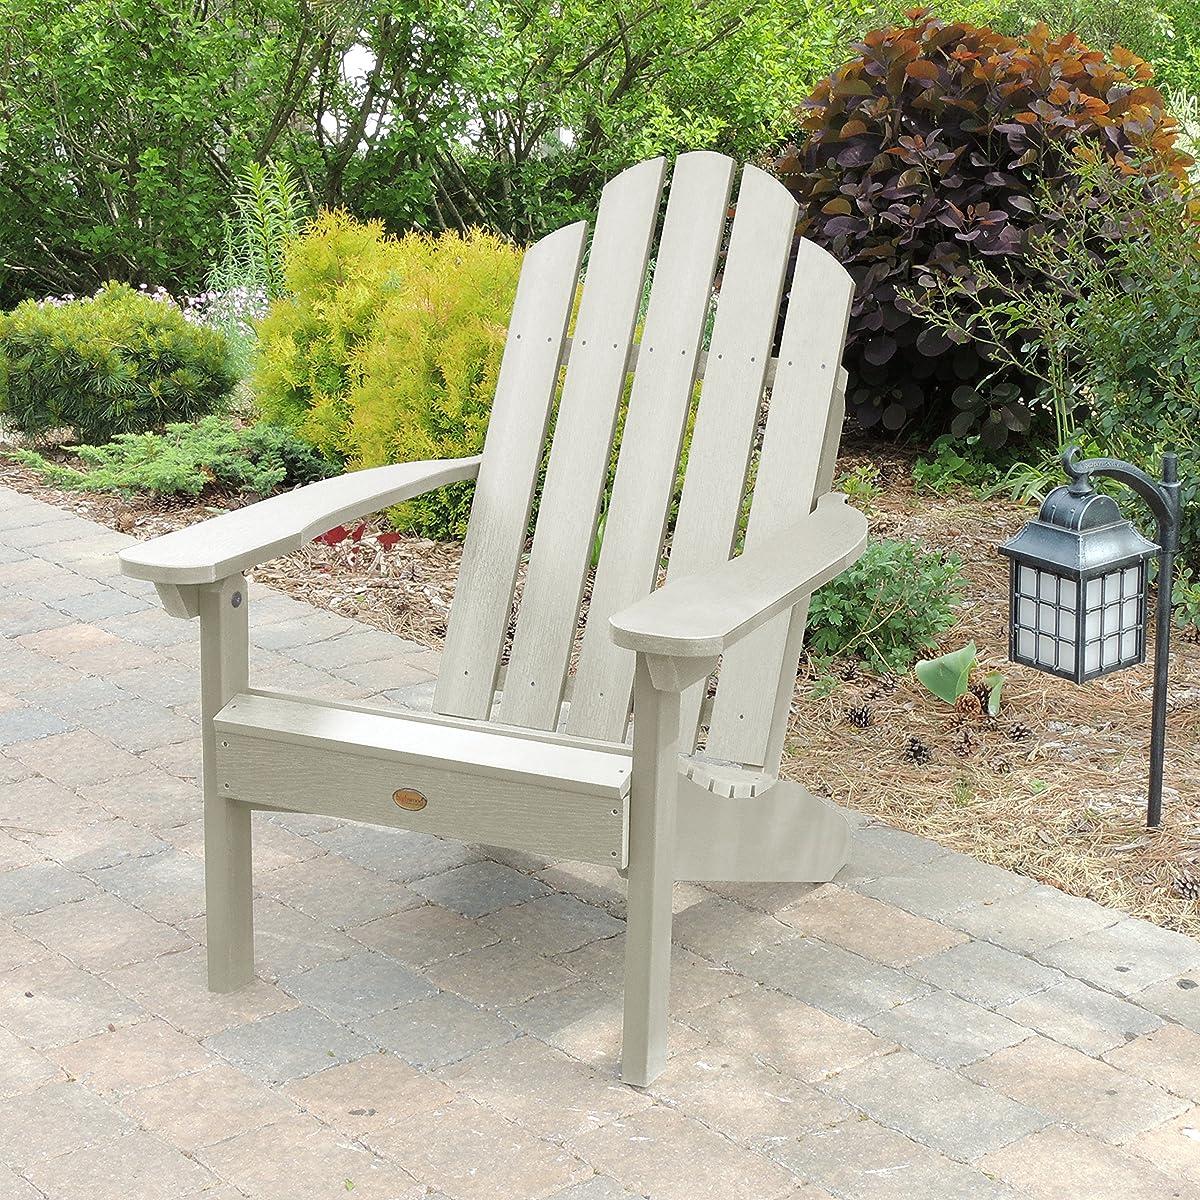 Highwood Classic Westport Adirondack Chair, Whitewash